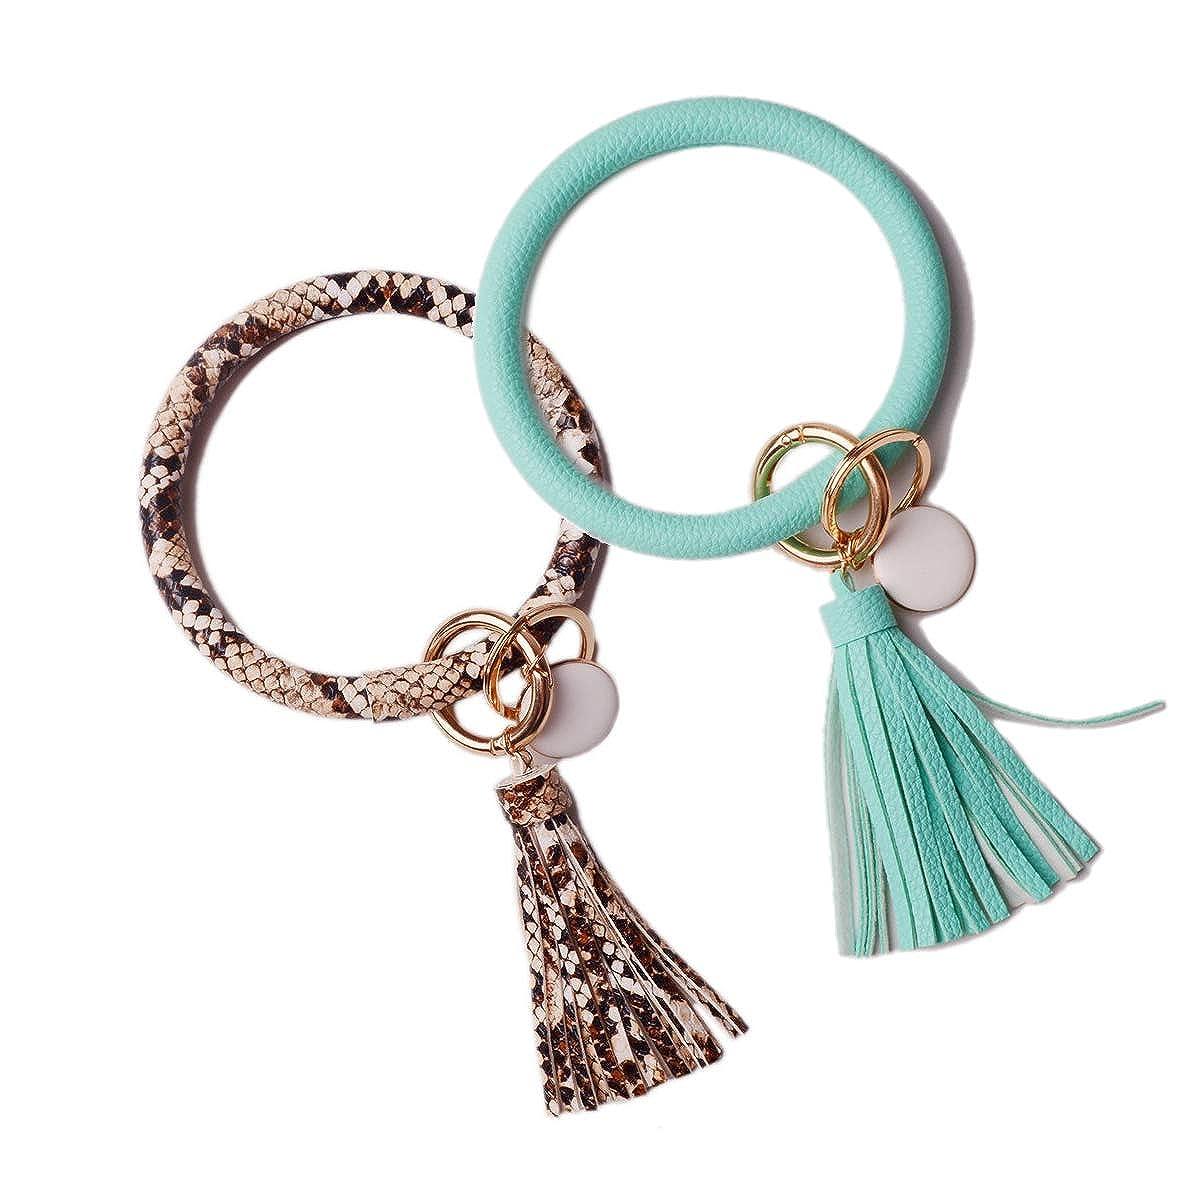 L/&N Rainbery PU Leather Oversized Bracelet Keychain Circle Tassel Wristlet Bangle Keyring for Women Girls